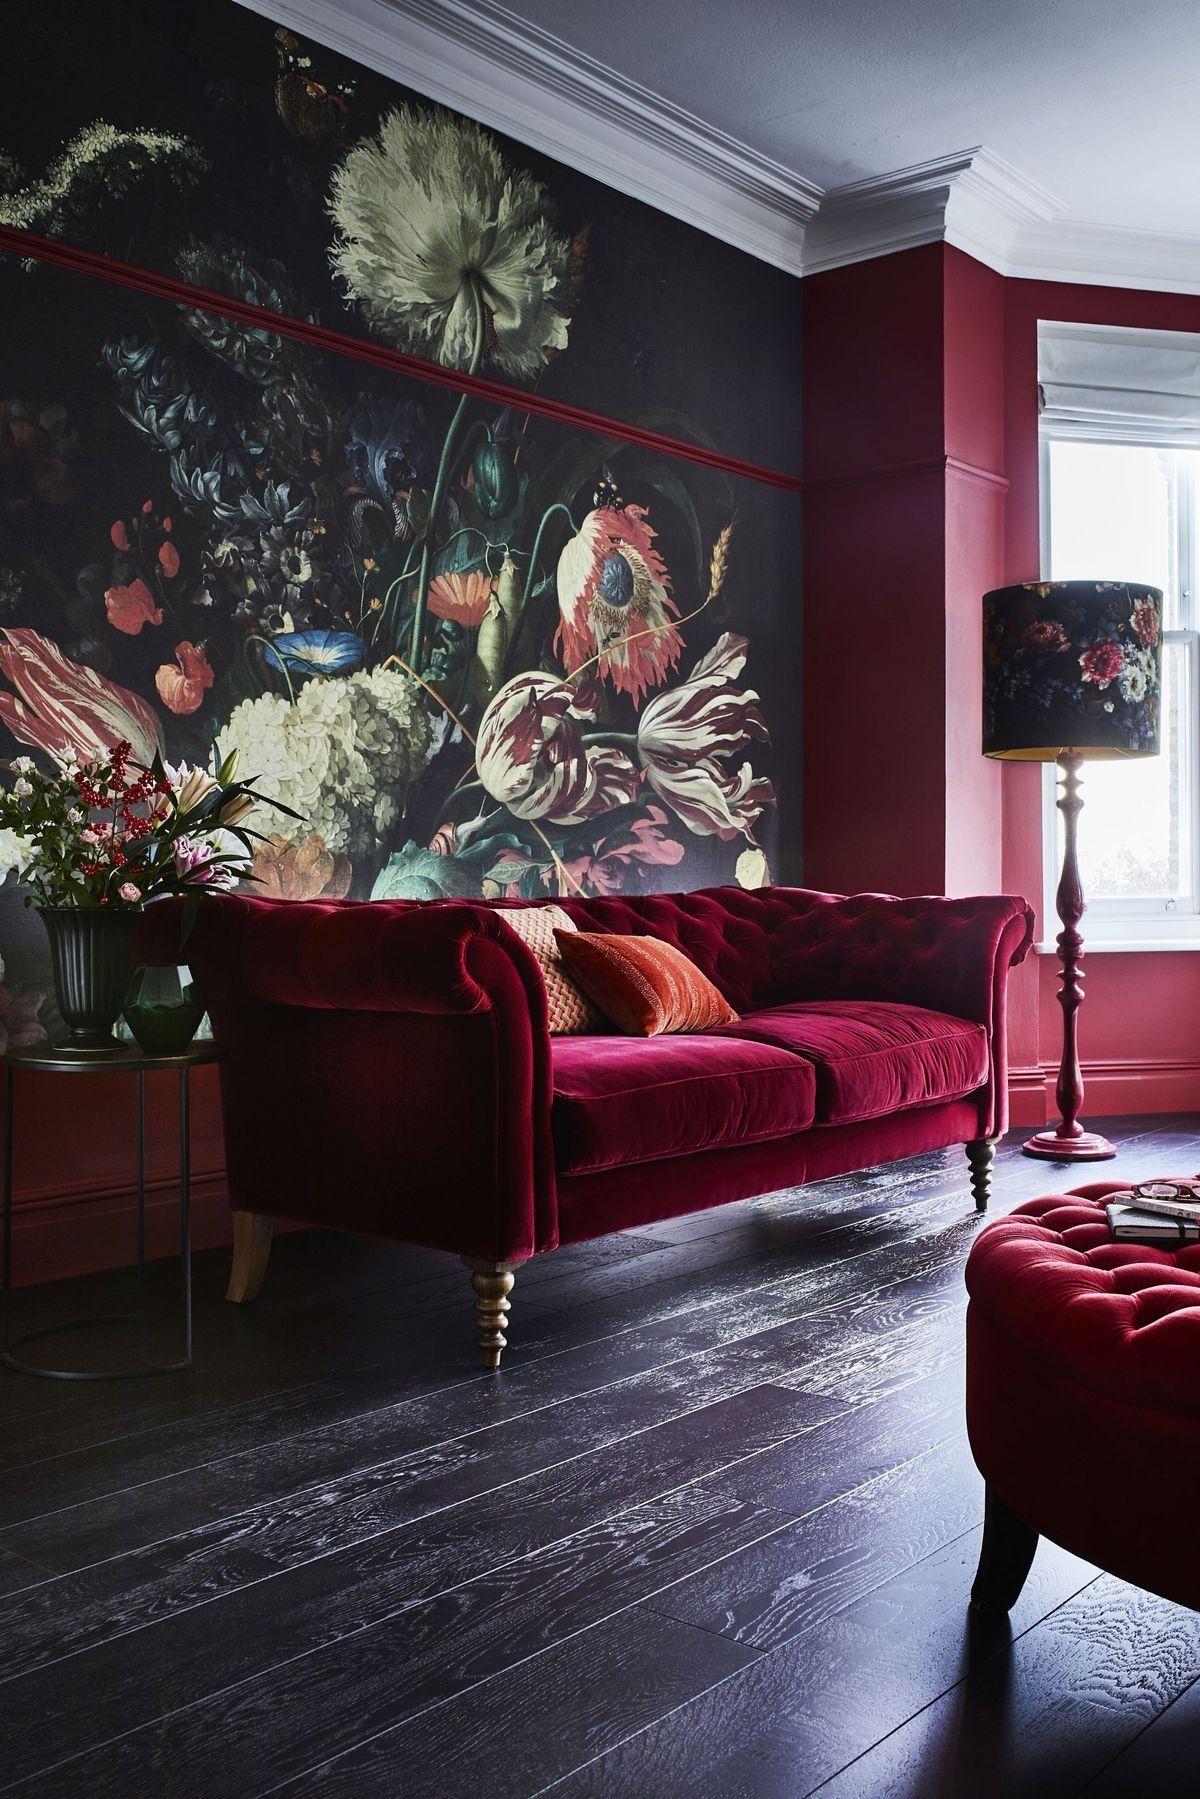 Dark Floral Mural And Rich Cranberry Velvet Sofa Home Interior Design House Interior Home